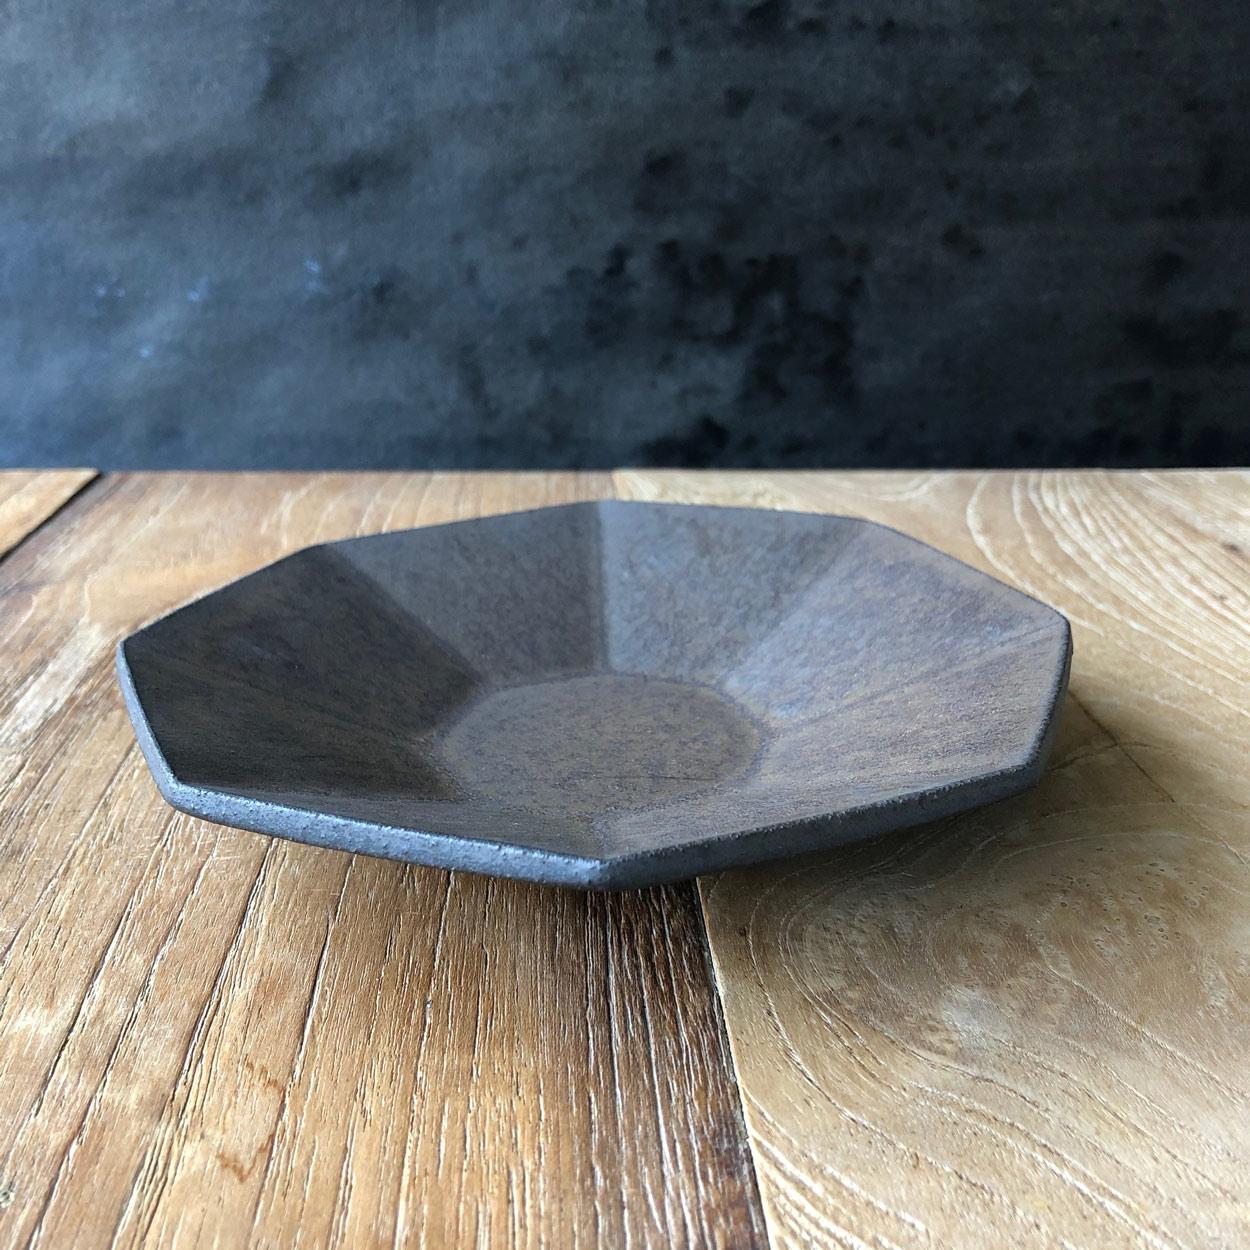 Plate-Japanese-Ceramics-Shinobu-Hashimoto-Galerie-h-Geneva